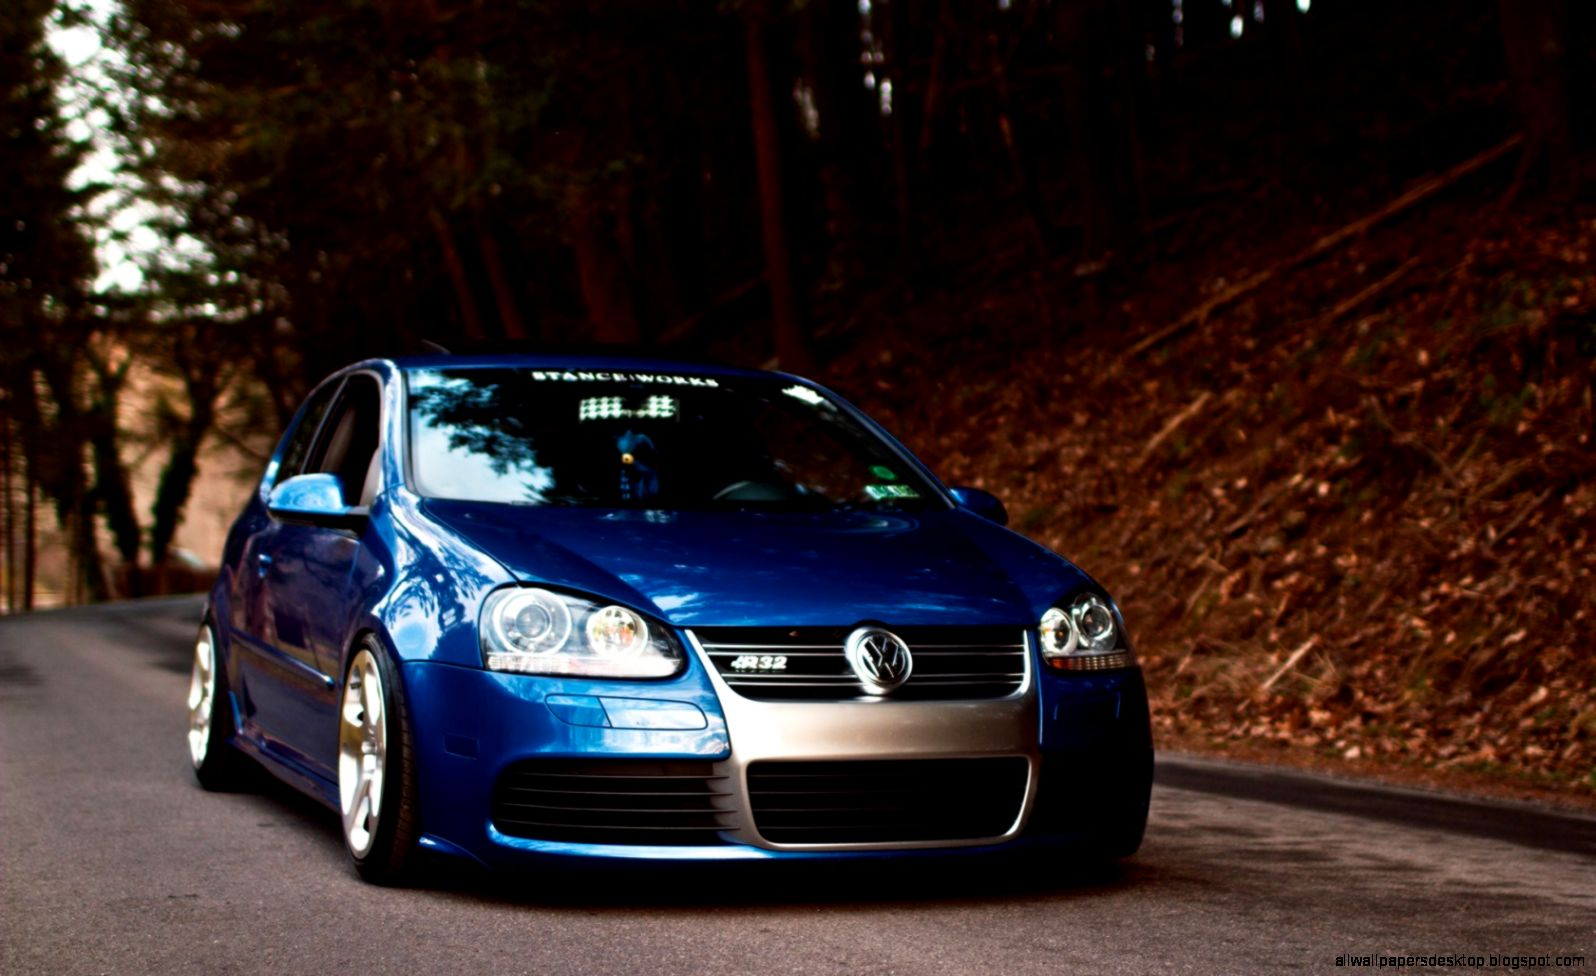 Charmant View Original Size. Volkswagen Golf GTI MKV ...